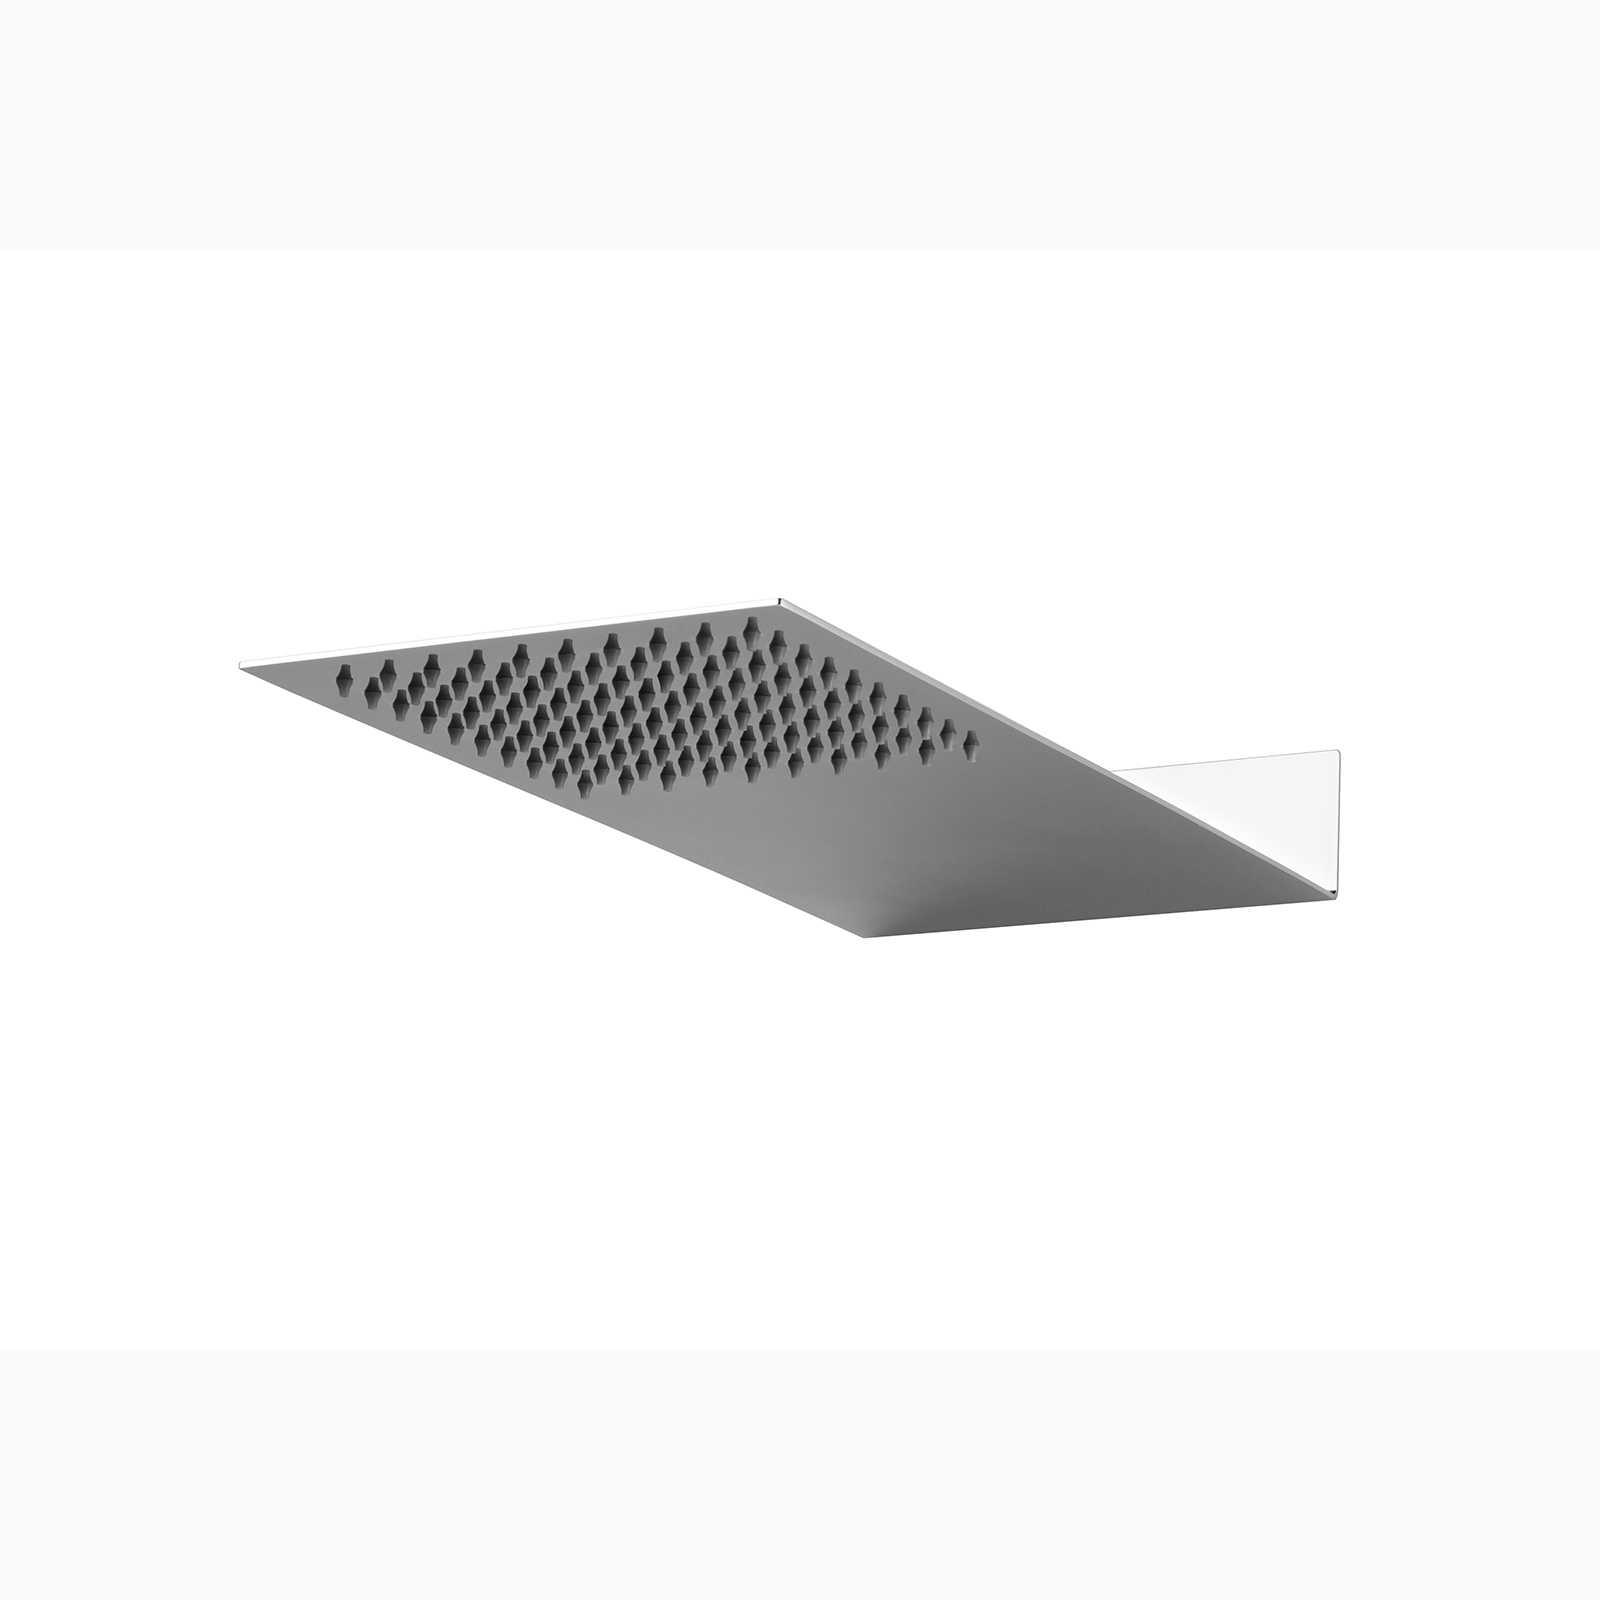 Soffione doccia a muro ultraslim Ares Blade 430x200 mm in acciaio inox